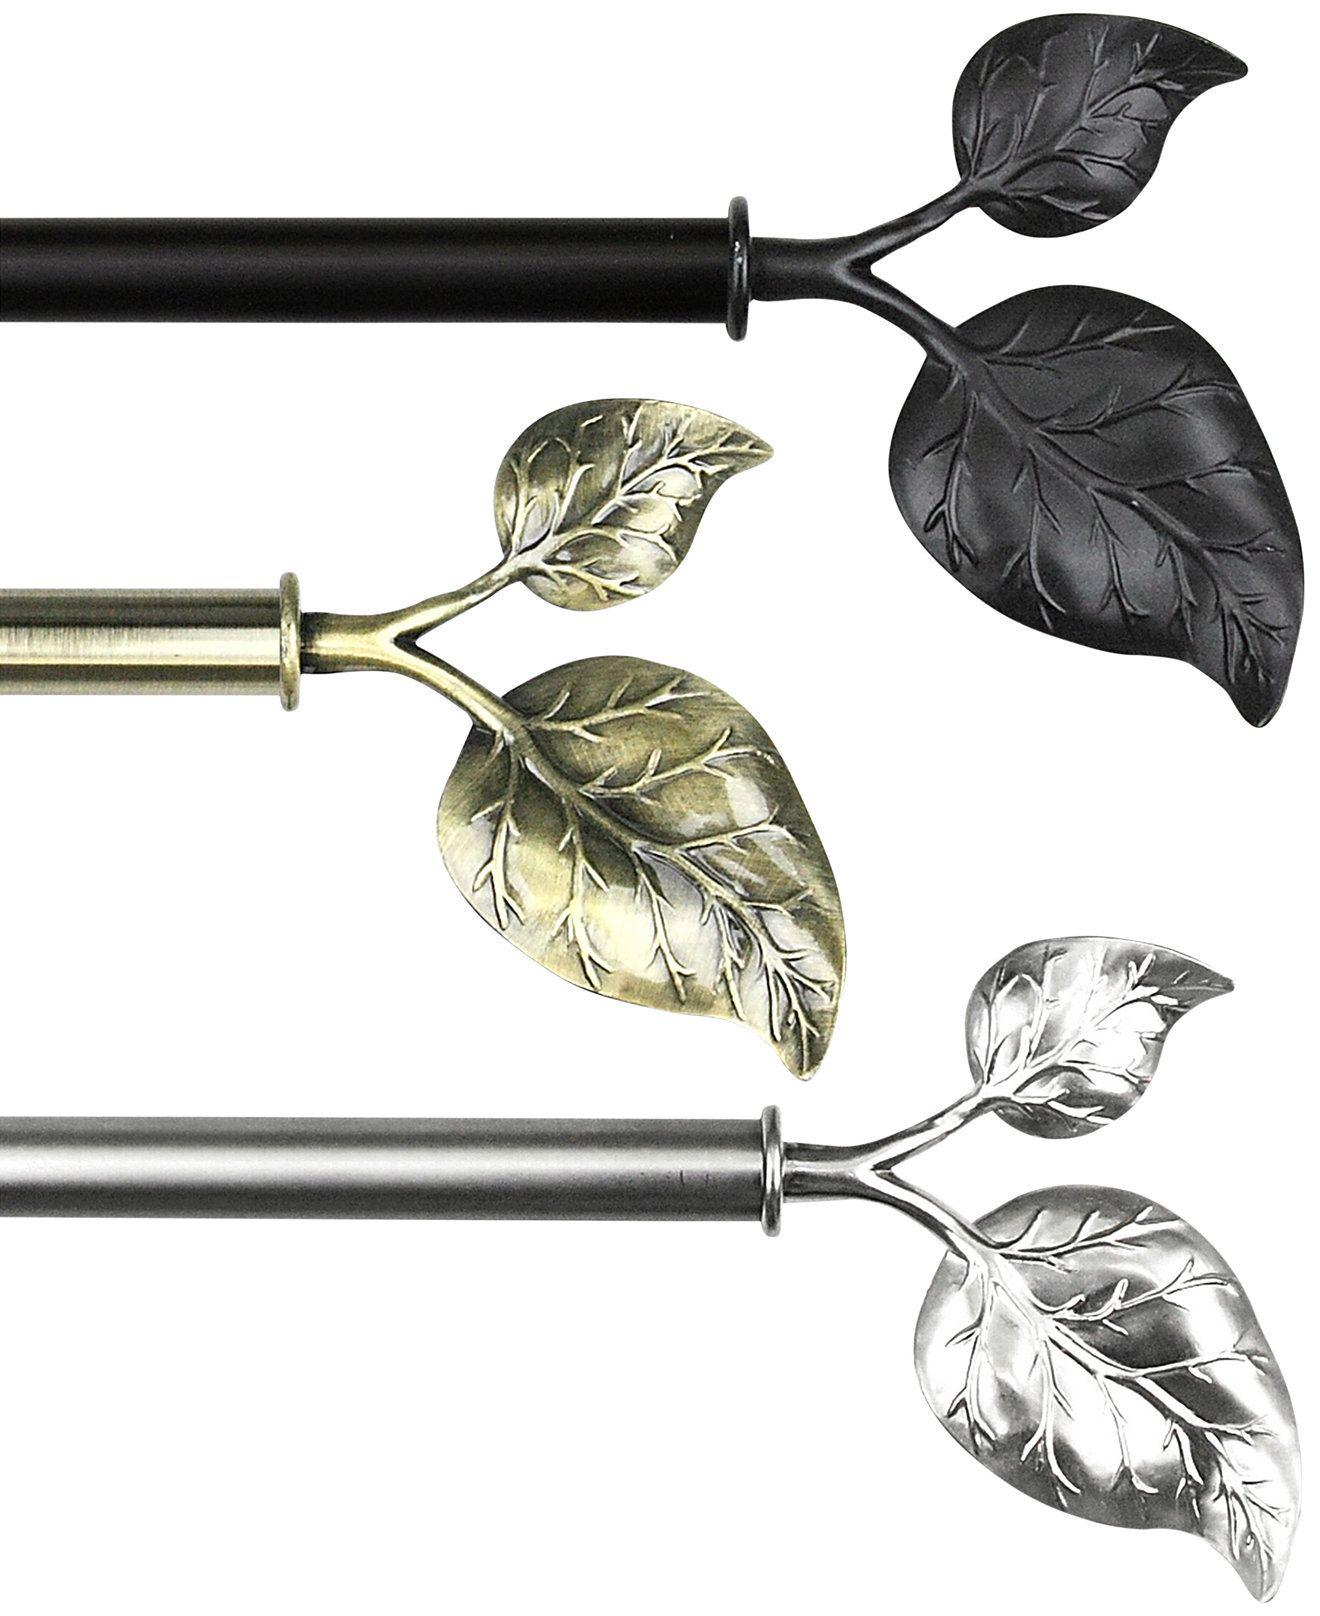 Rod desyne ivy